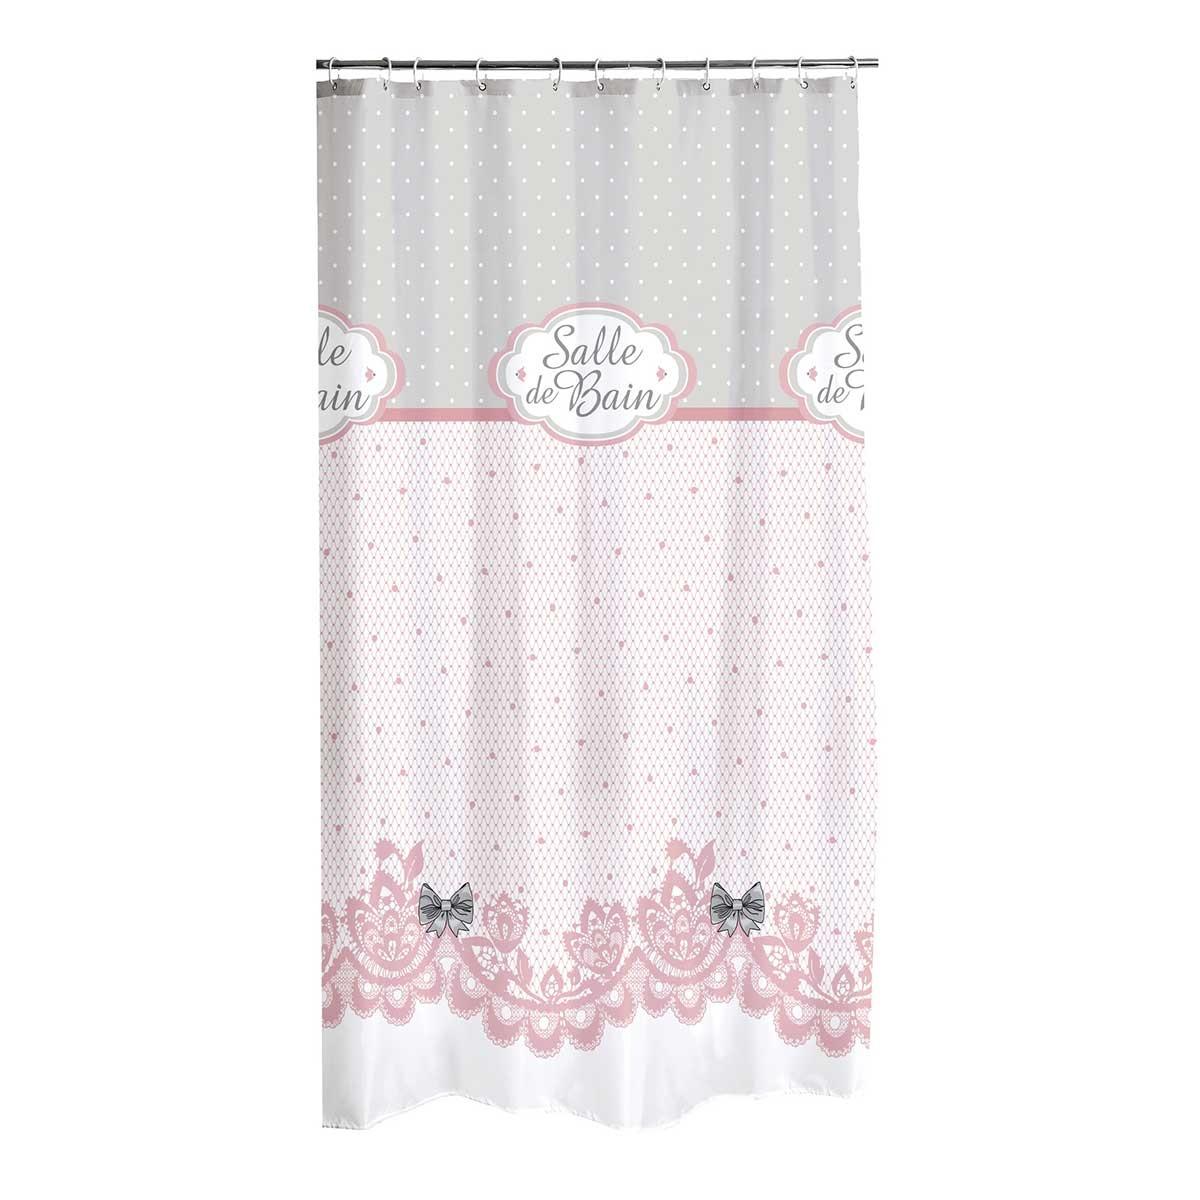 Rideau De Douche Esprit Girly Rose Et Blanc Homebain Vente